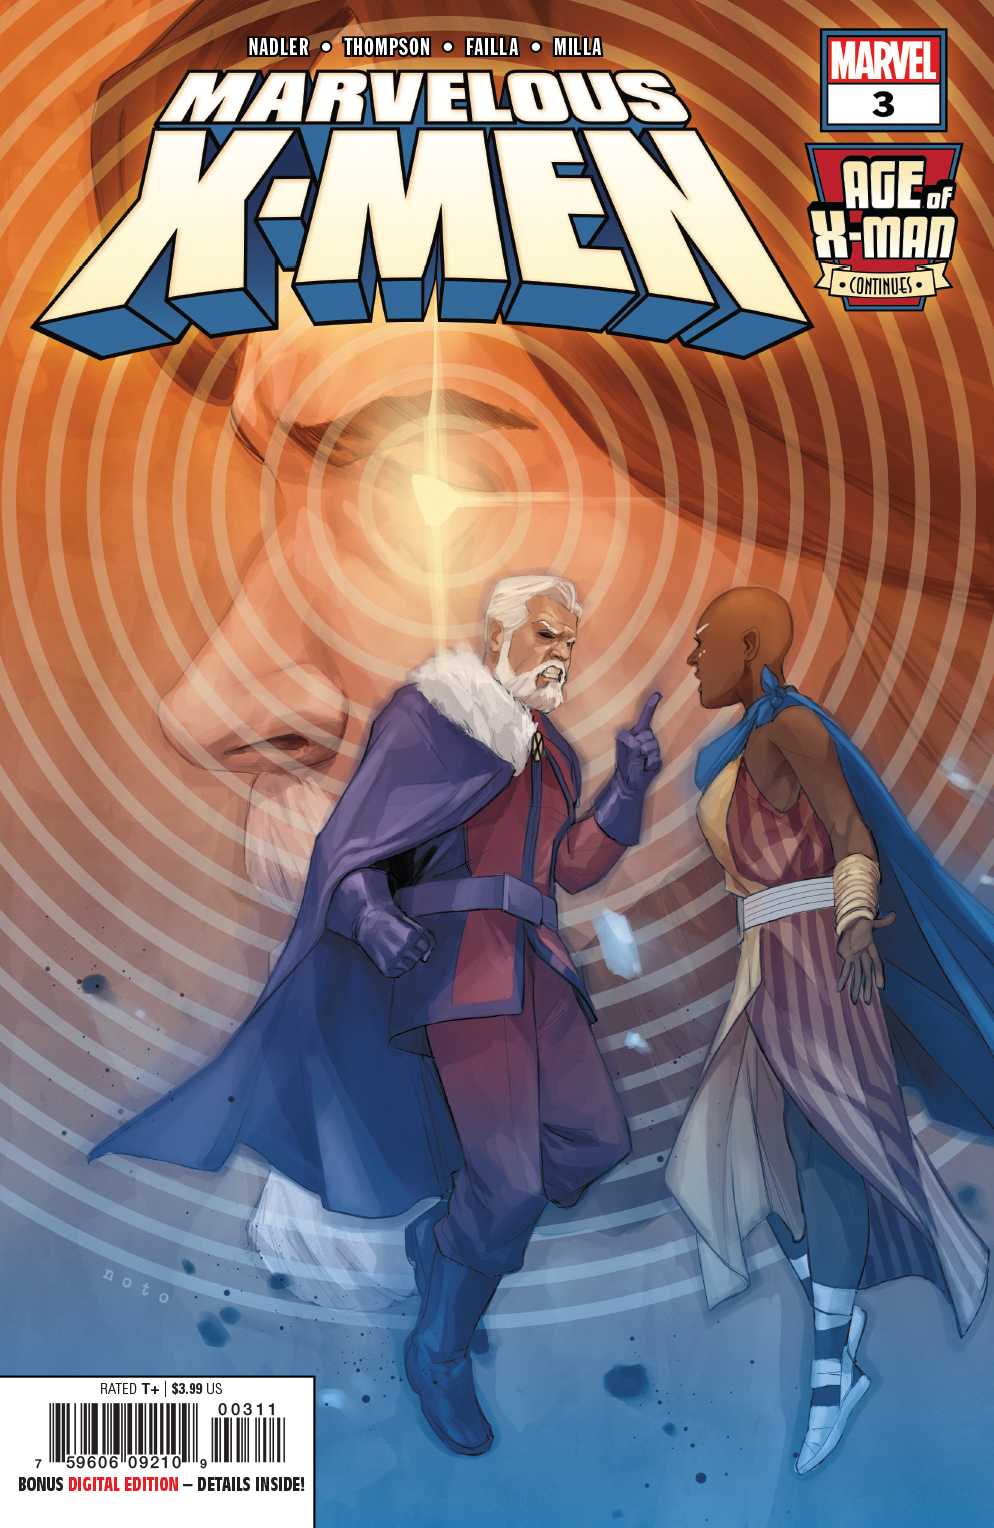 Age of X-Man Marvelous X-men #3.jpg